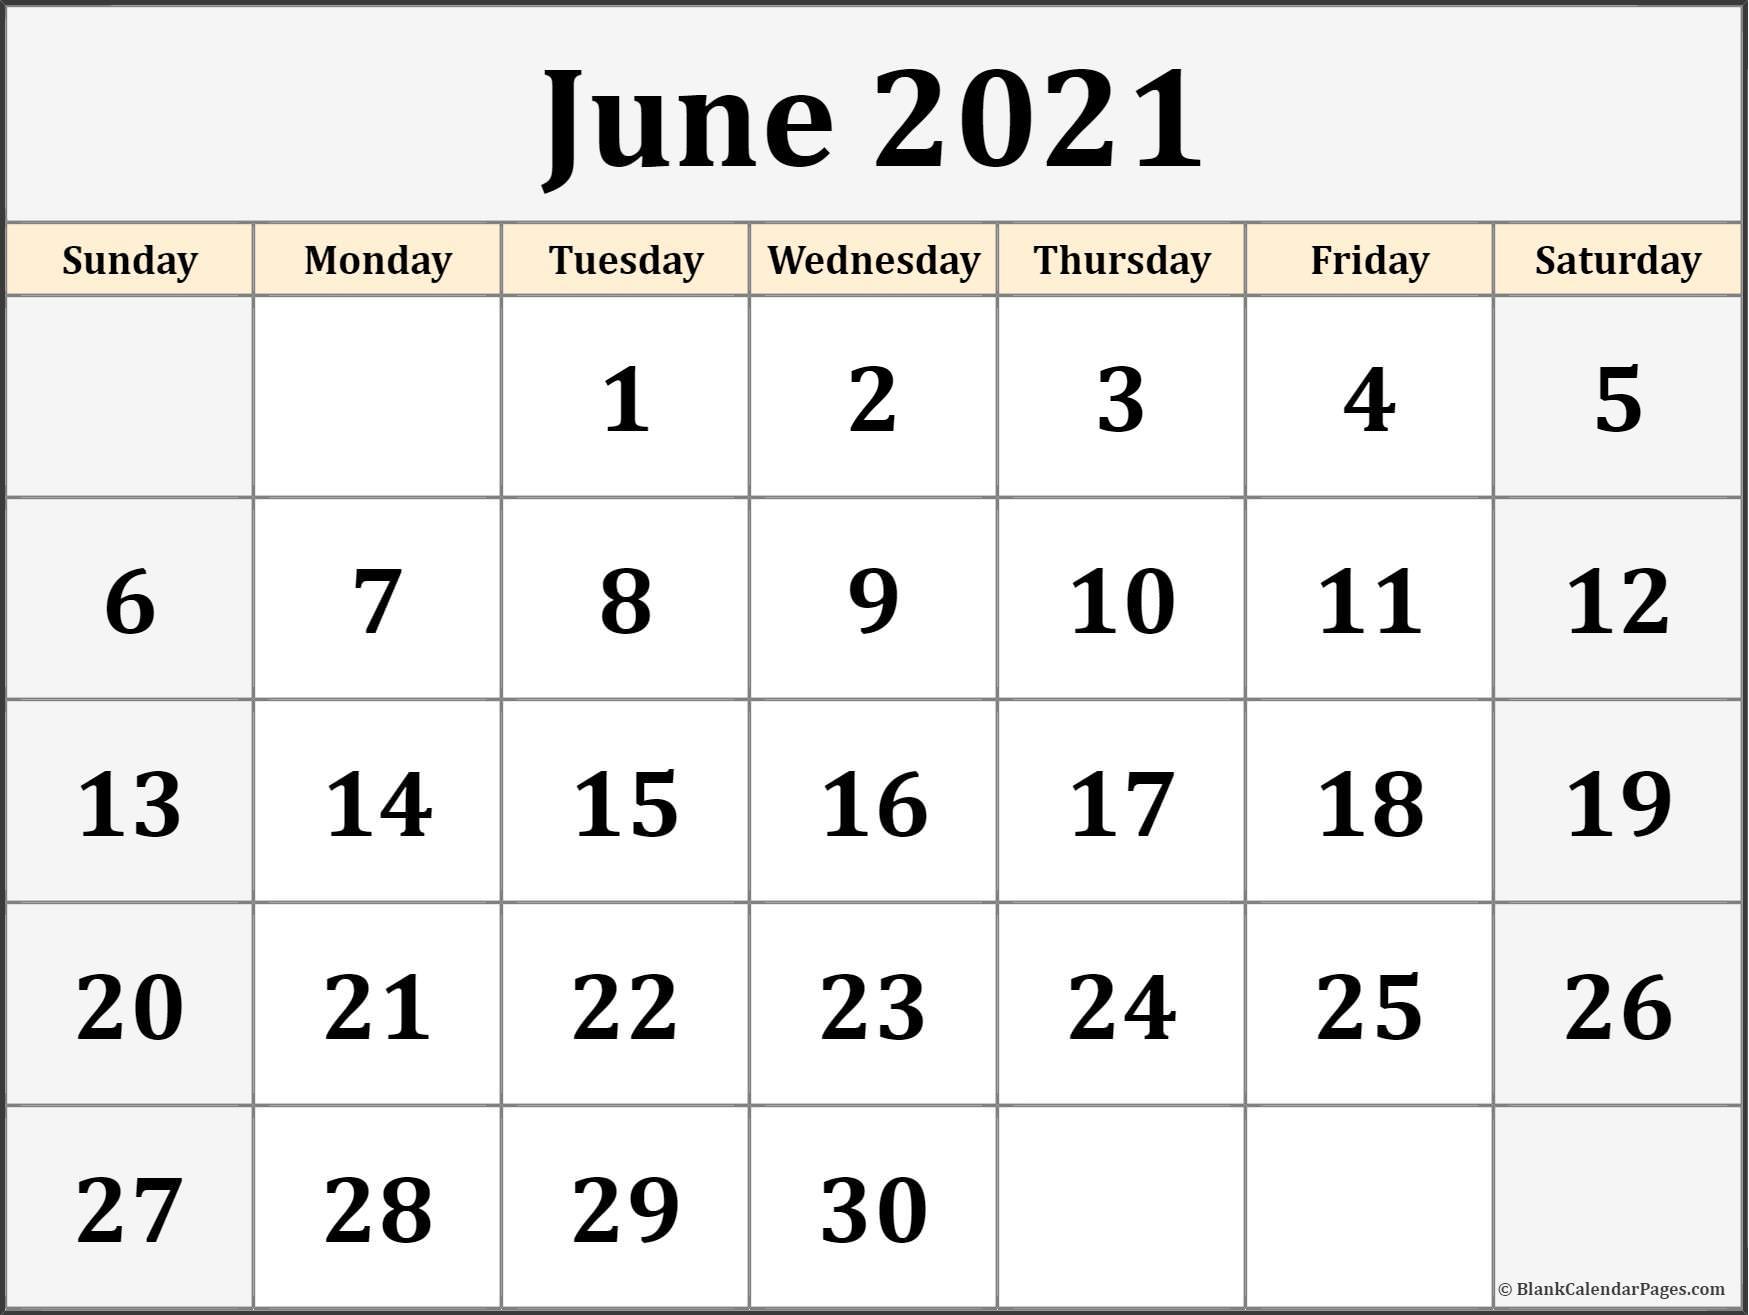 June 2021 Calendar | Free Printable Calendar Templates pertaining to 2021 Writable Calendars By Month